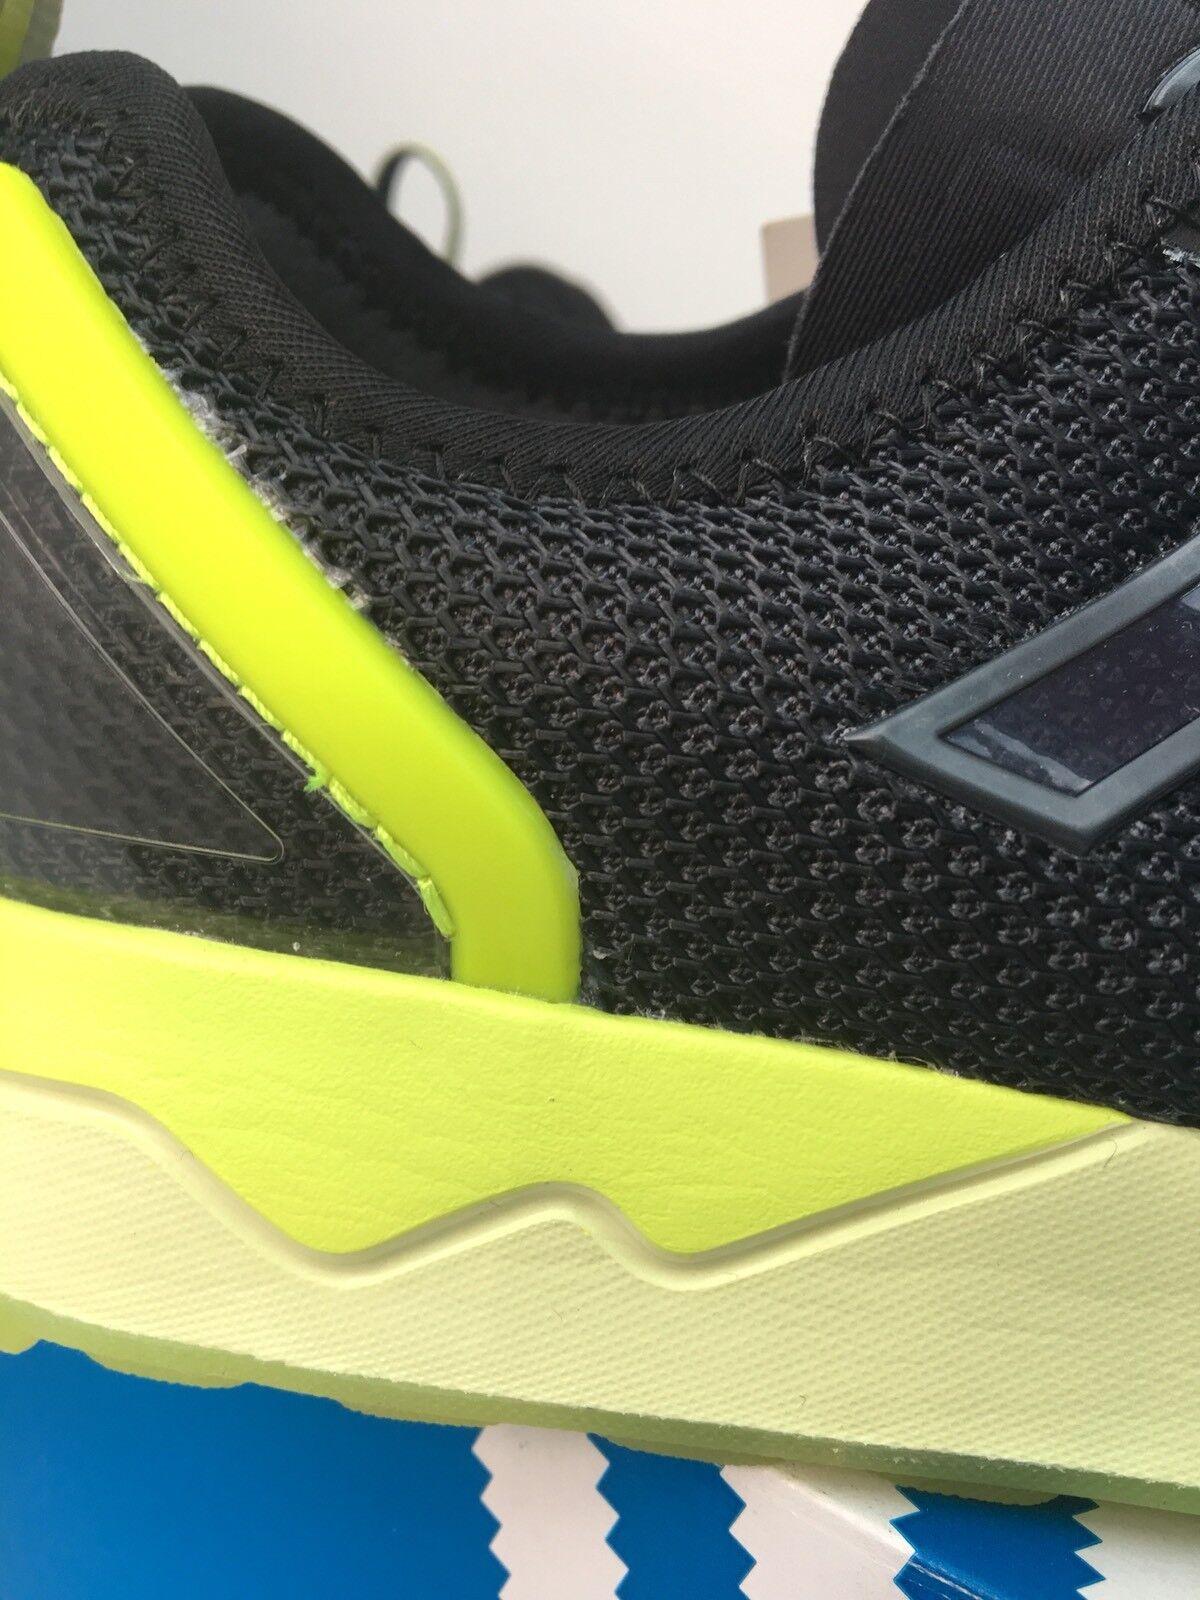 adidas adidas adidas ZX Flux ADV Trainers Sneakers AQ49068 Brand New In Box Noir Halo ec5dbb